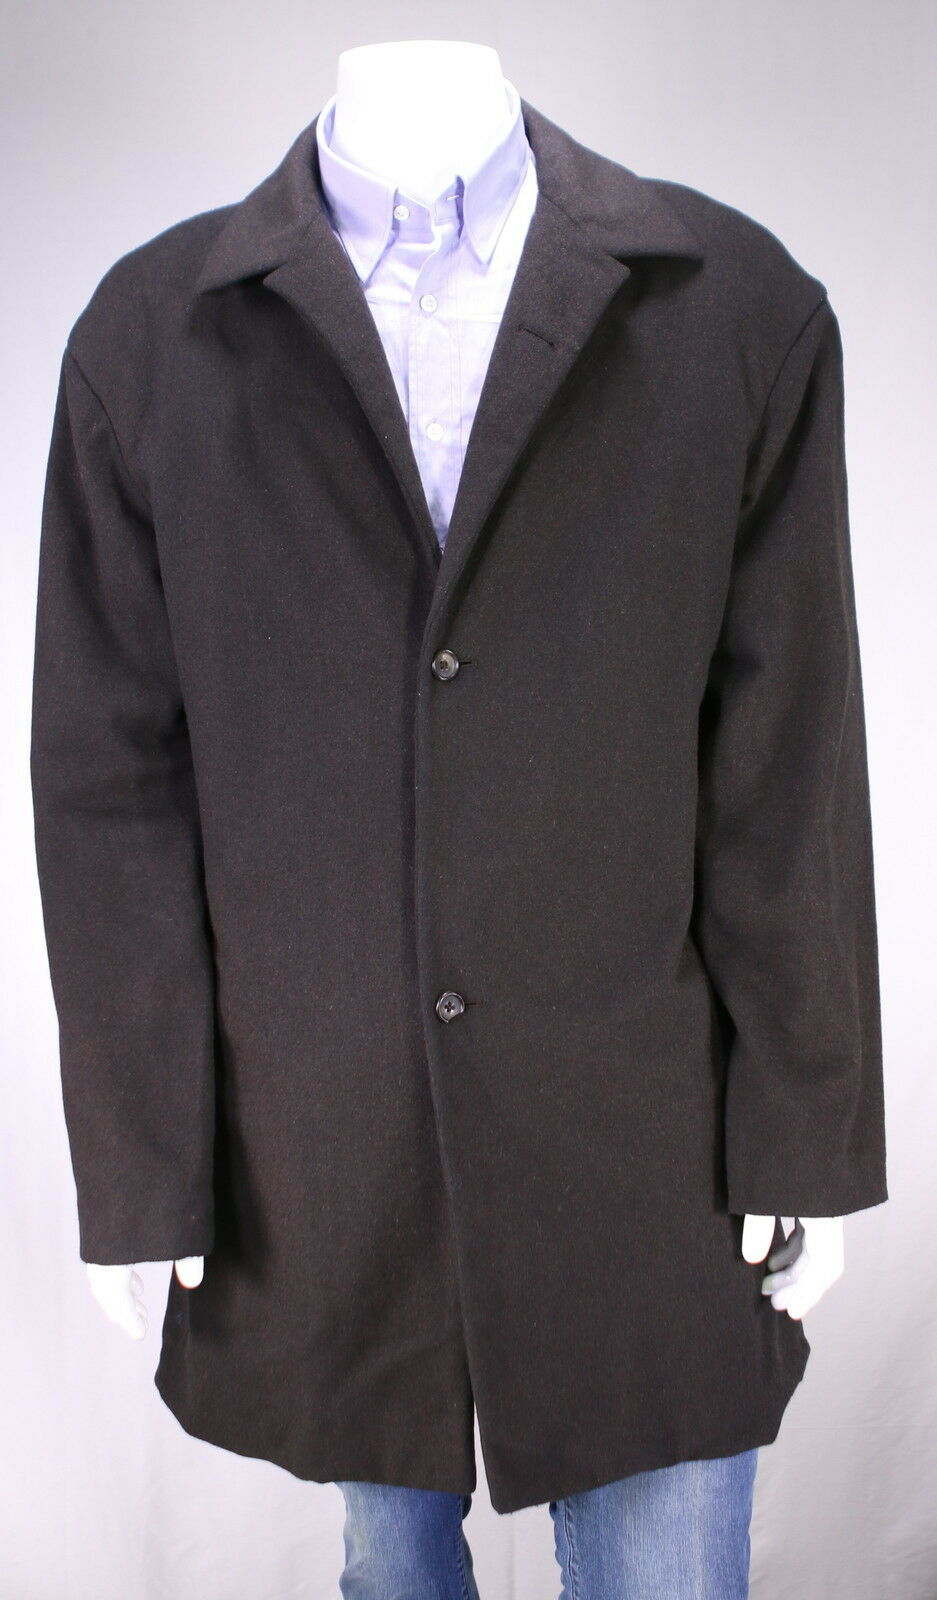 JIL SANDER  Tailor Made Braun Wool-Cashmere Fleece Flannel 3-Btn Overcoat 38R